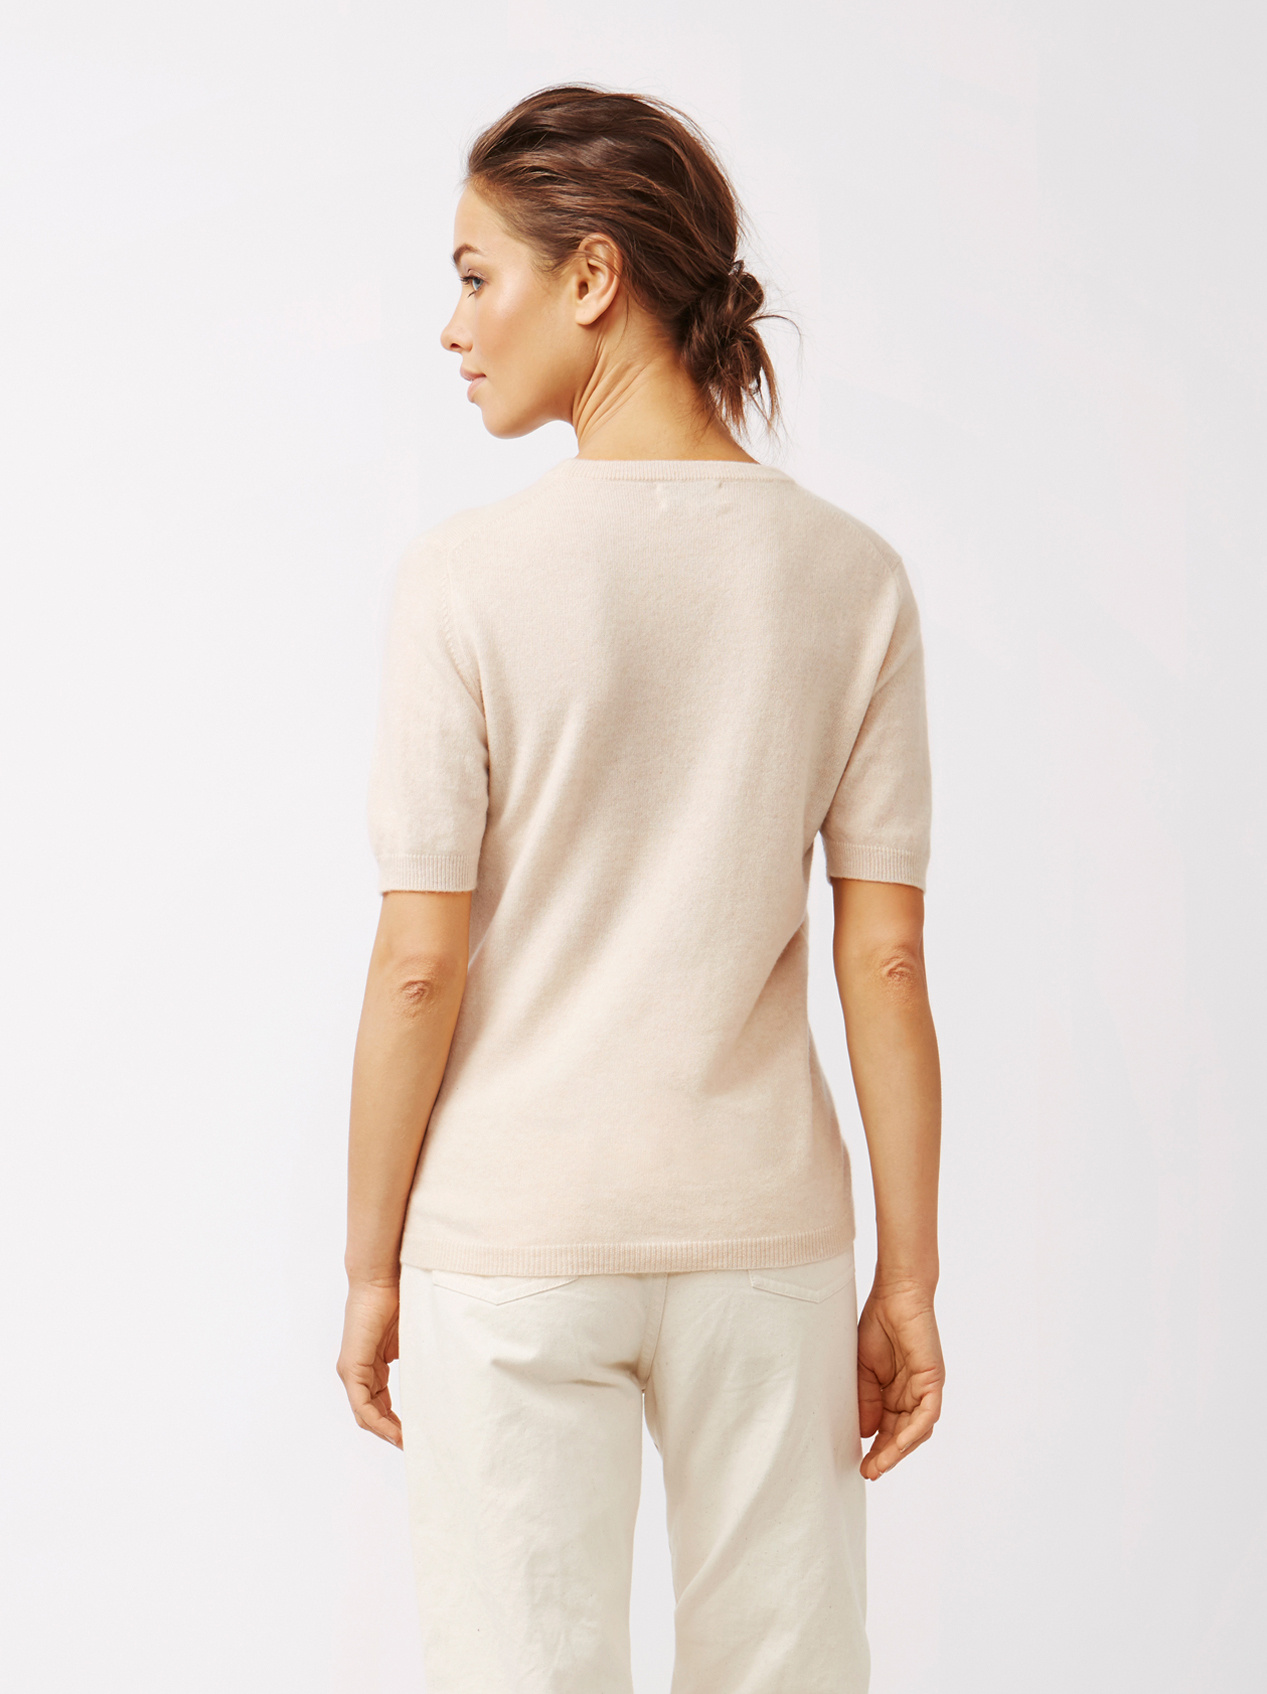 Soft Goat Women's Short Sleeve O-Neck Beige